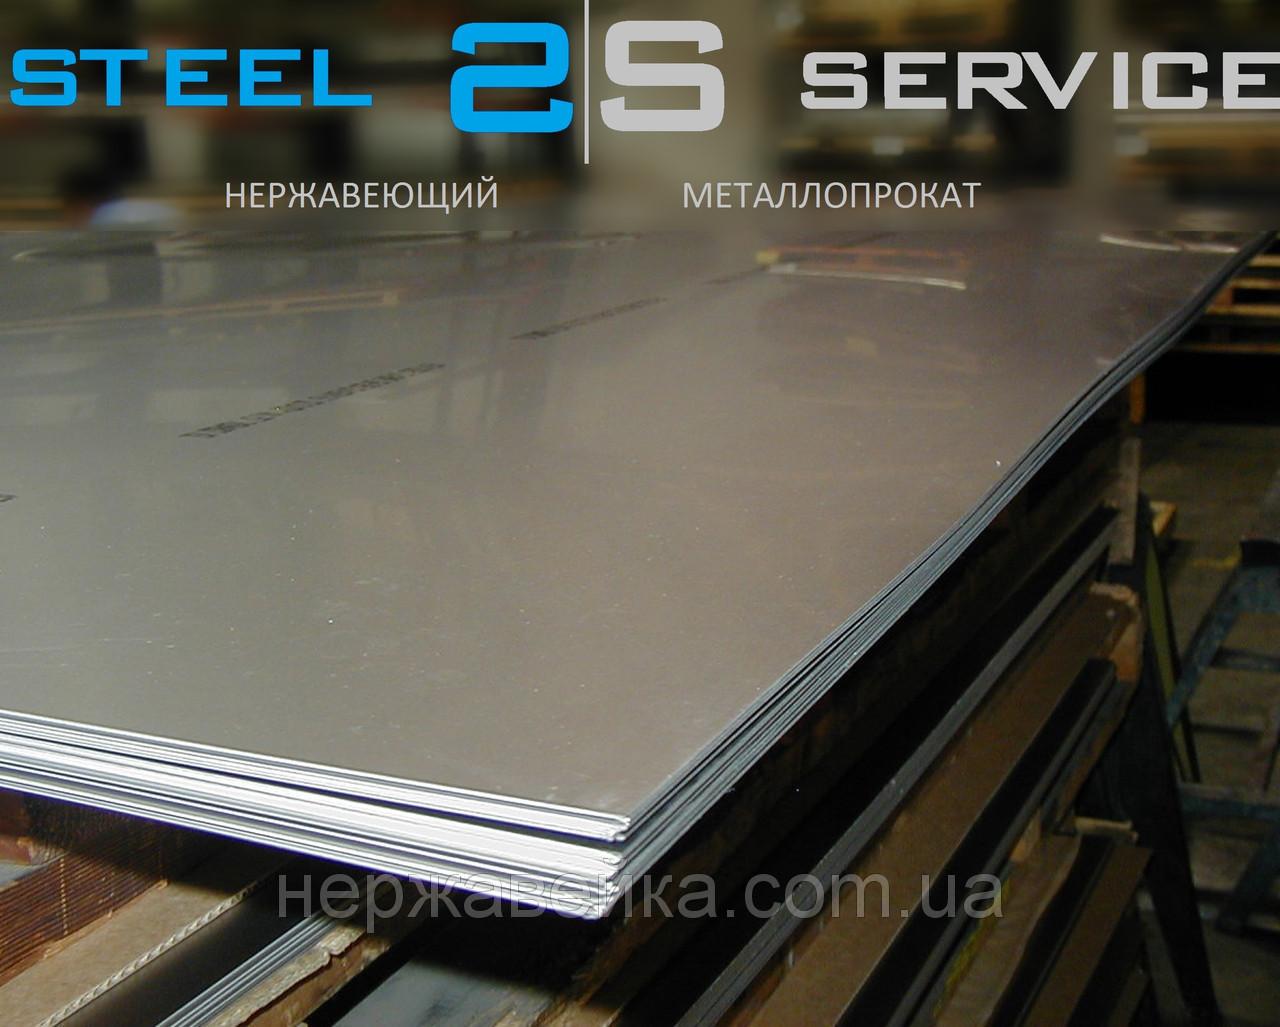 Листовая нержавейка 14х1000х2000мм  AISI 310(20Х23Н18) F1 - горячекатанный,  жаропрочный